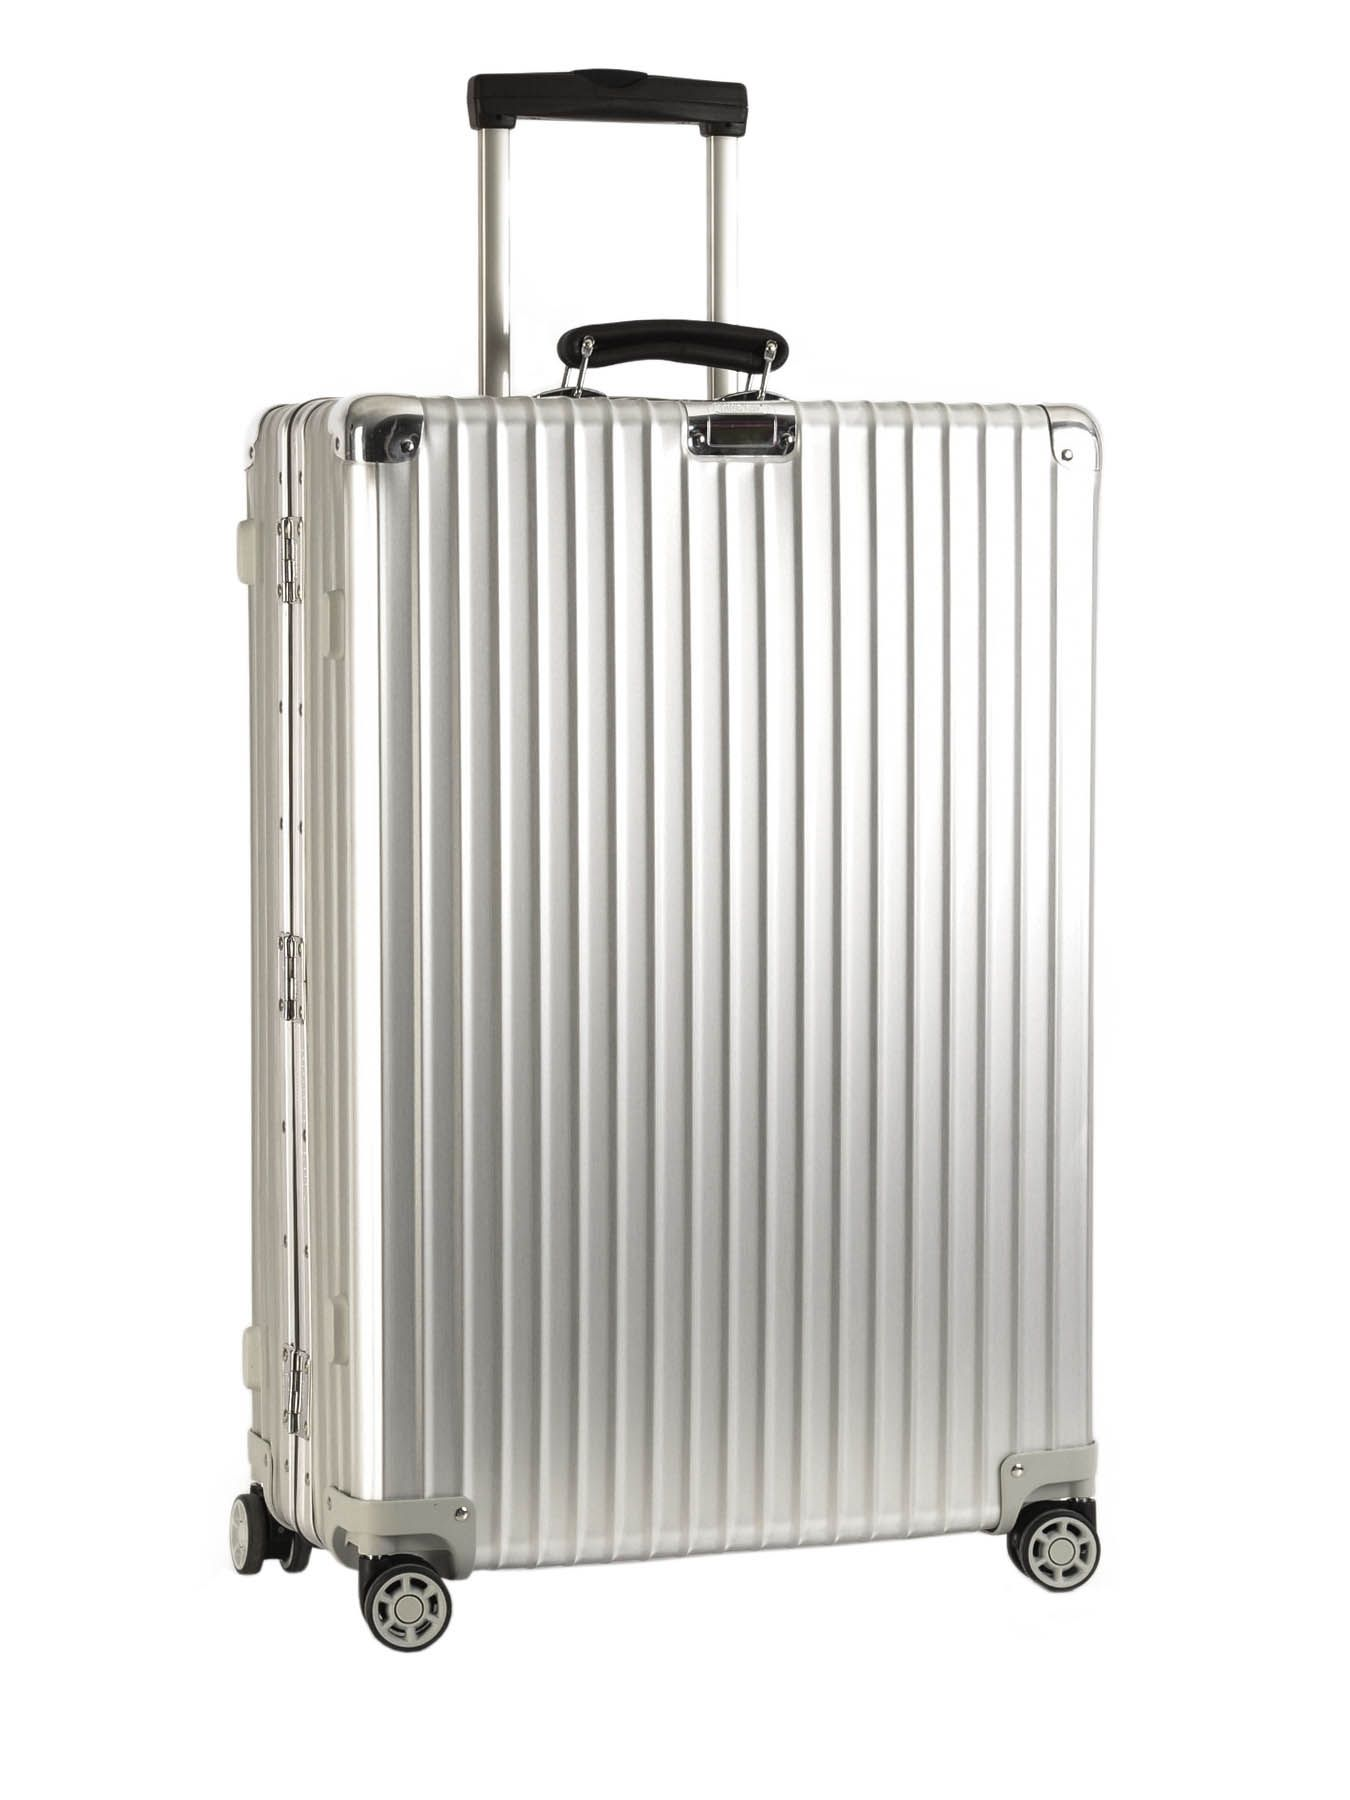 rimowa hardside luggage classic flight best prices. Black Bedroom Furniture Sets. Home Design Ideas